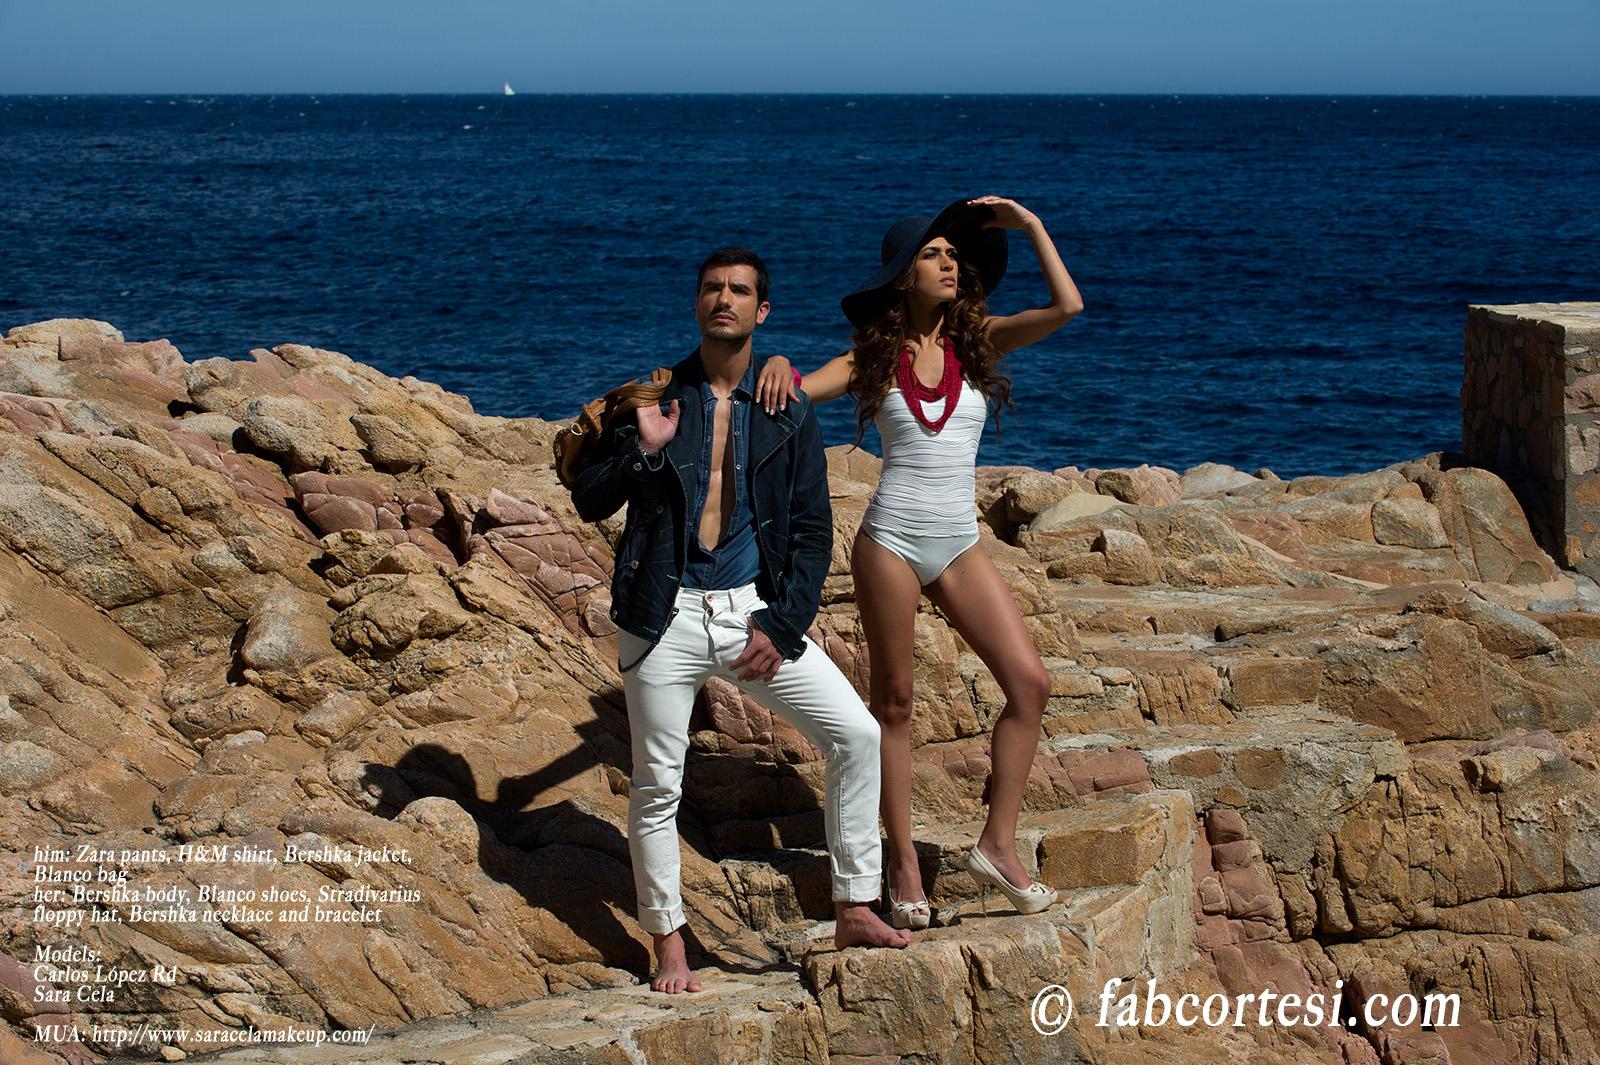 him: Zara pants, H&M shirt, Bershka jacket, Blanco bagher: Bershka body, Blanco shoes, Stradivarius floppy hat, Bershka necklace and braceletModels: Carlos López RdSara CelaMUA: http://www.saracelamakeup.com/